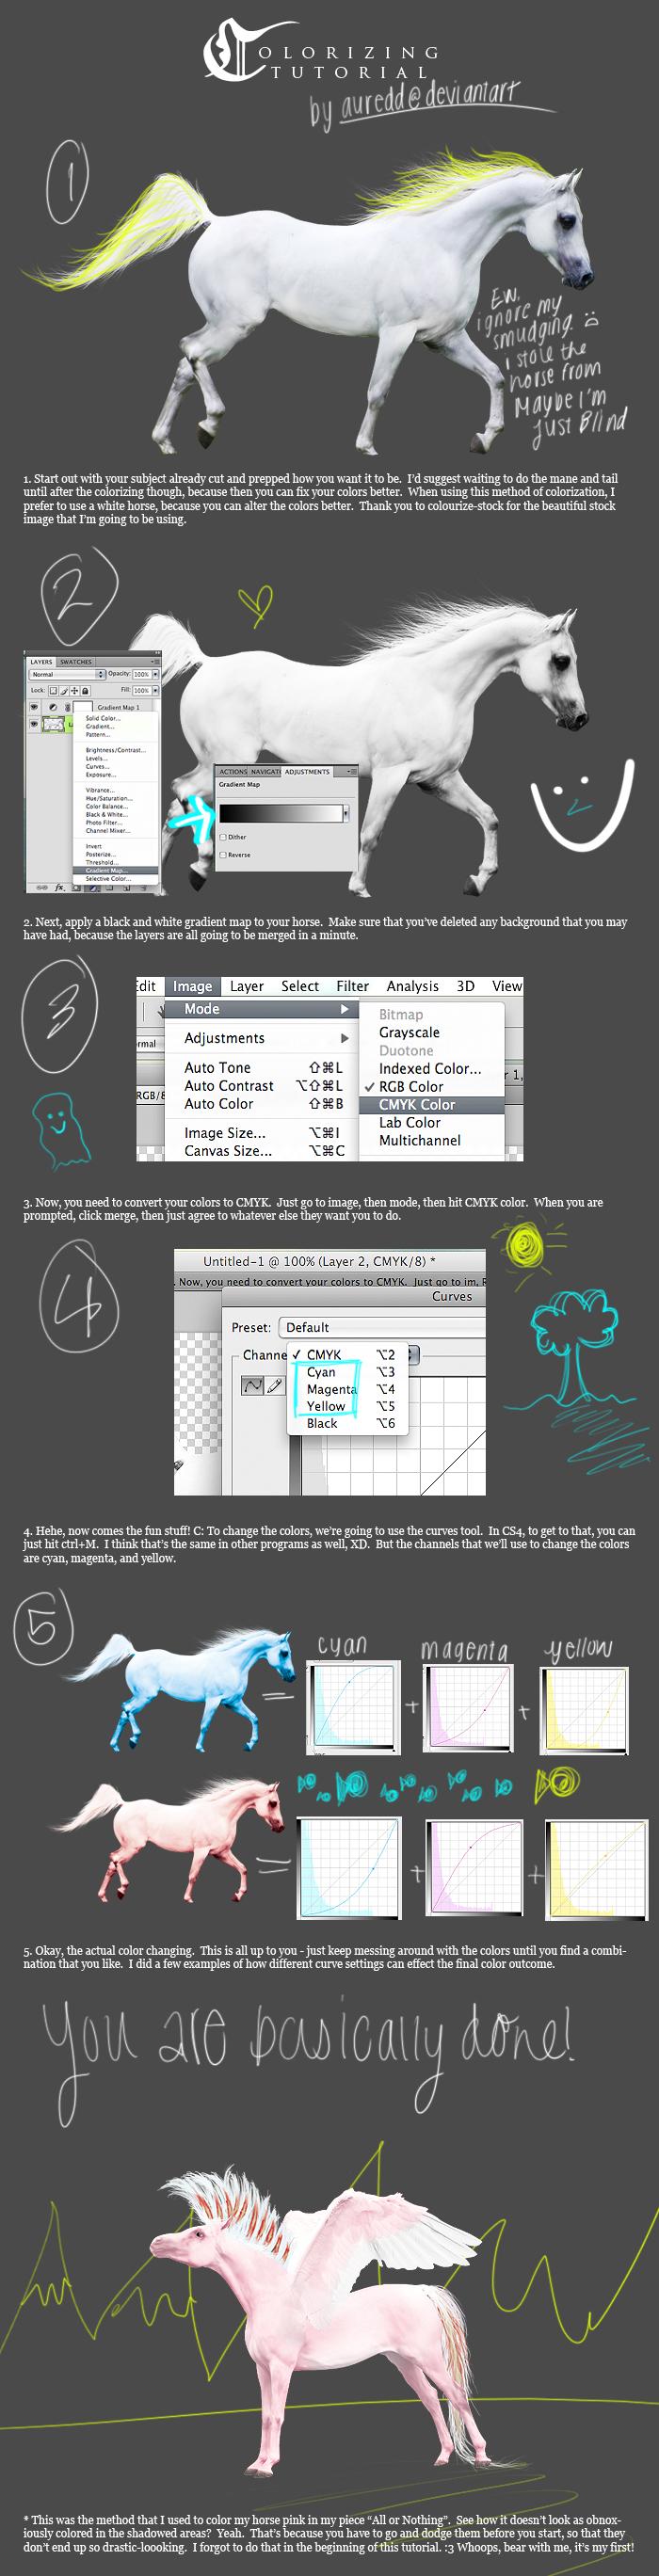 aur's colourizing tutorial